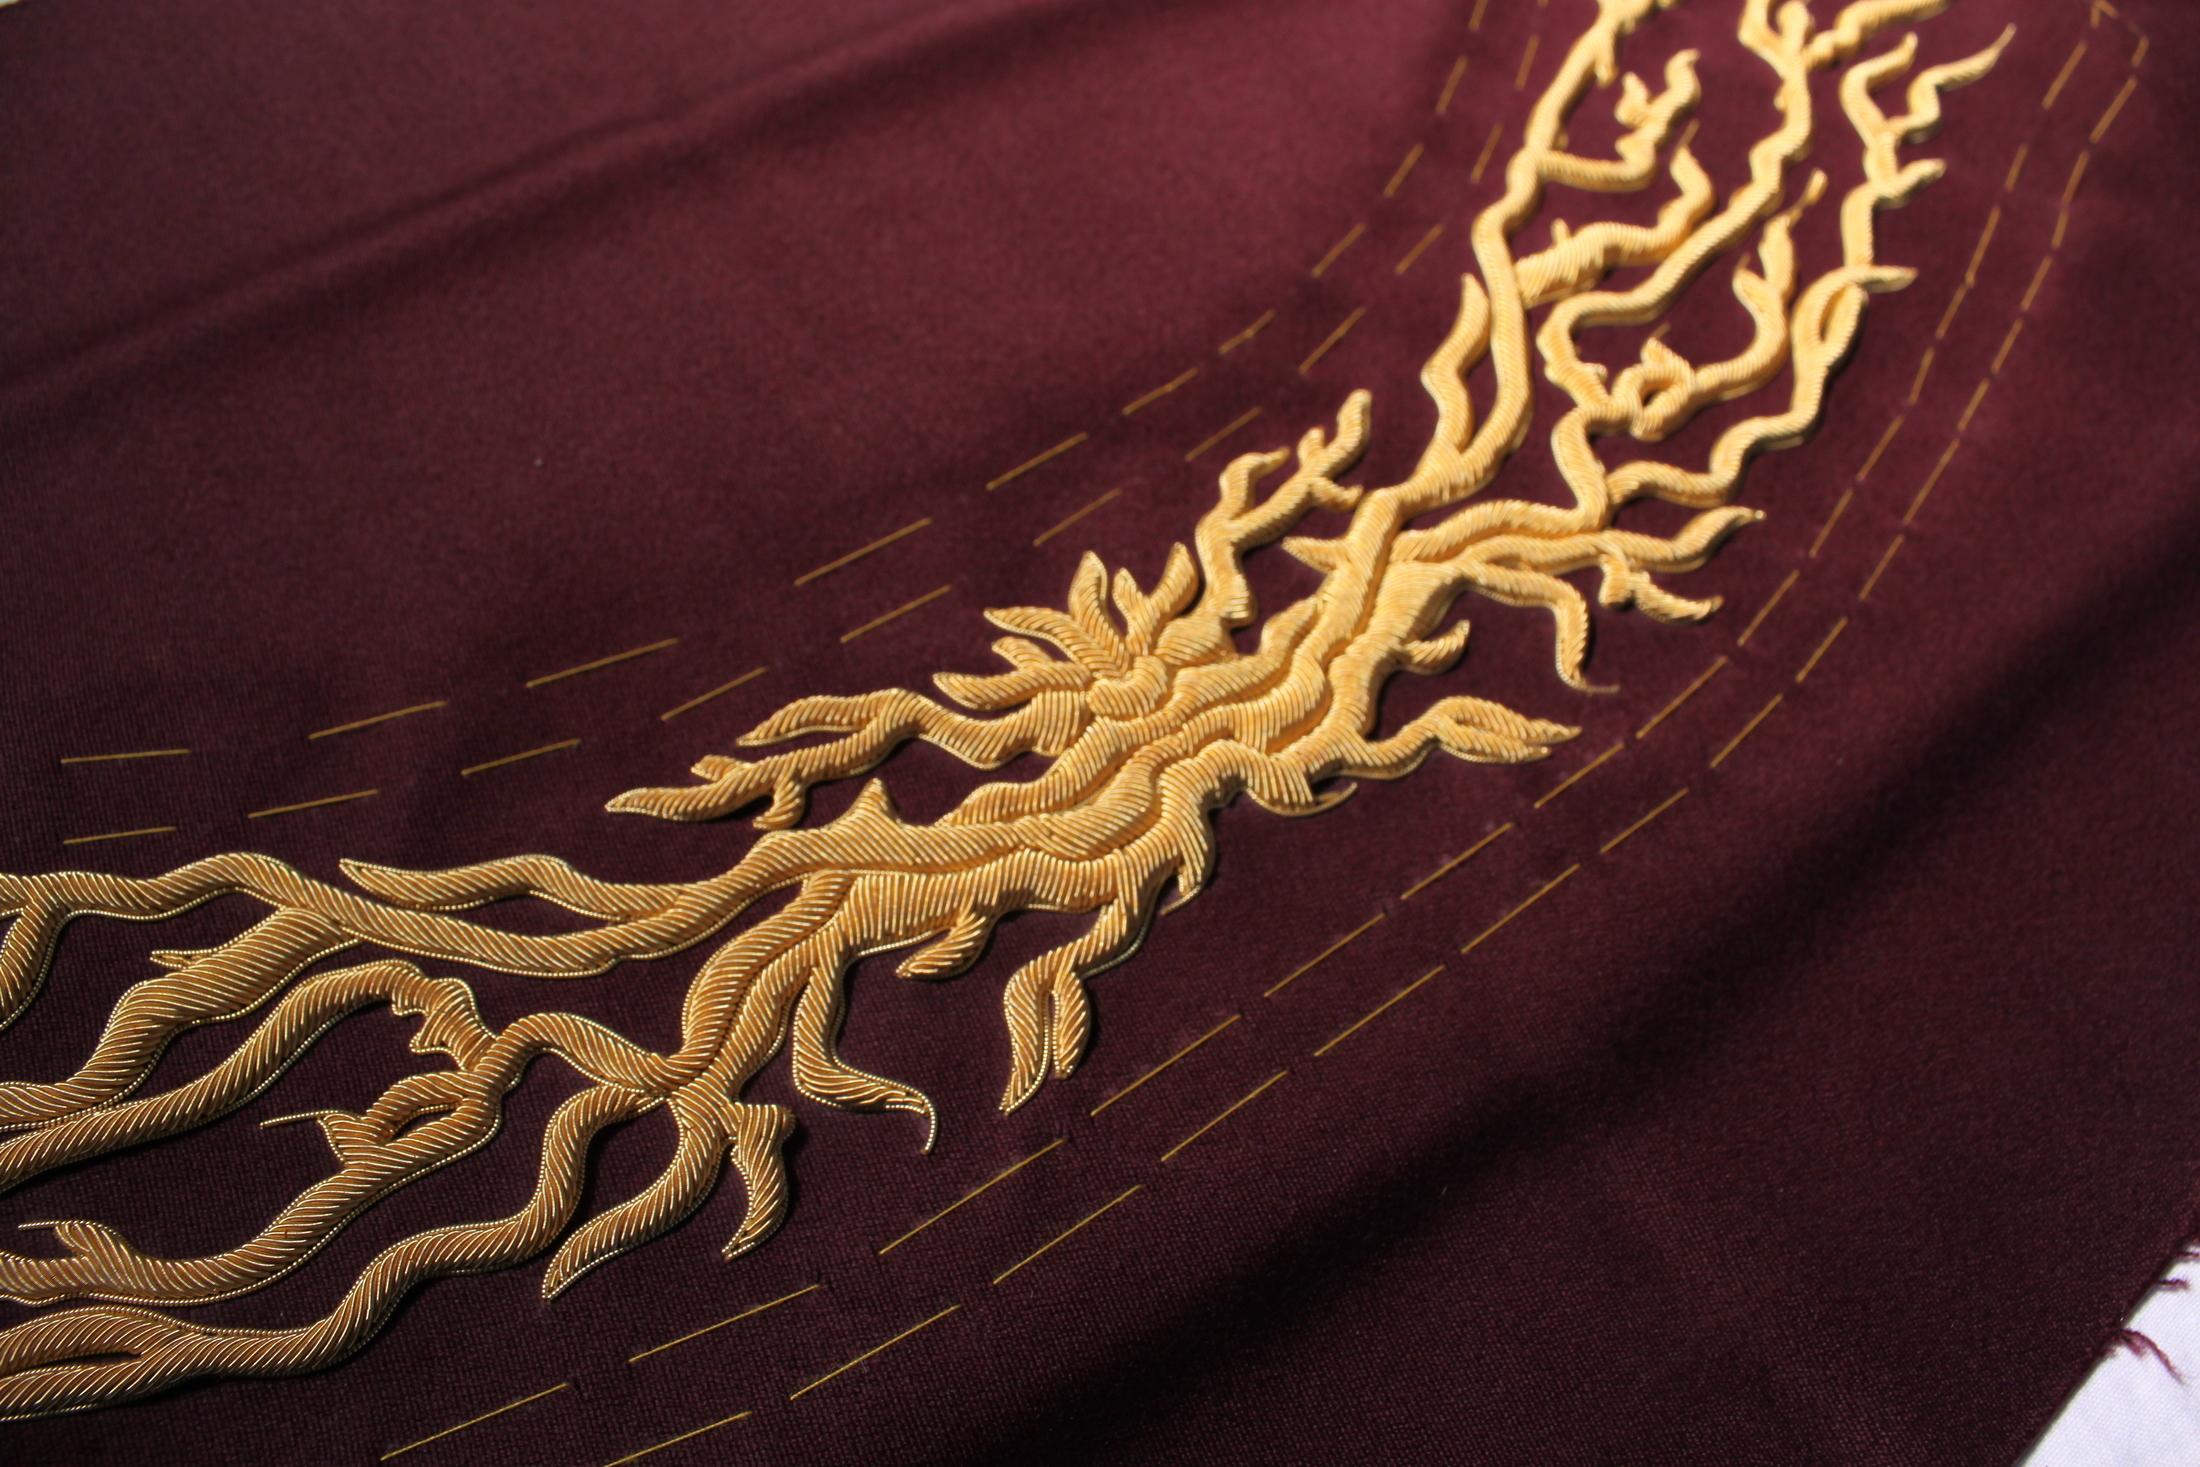 Hawthorne & Heaney does Joshua Kane SS16 London Hand Embroidery